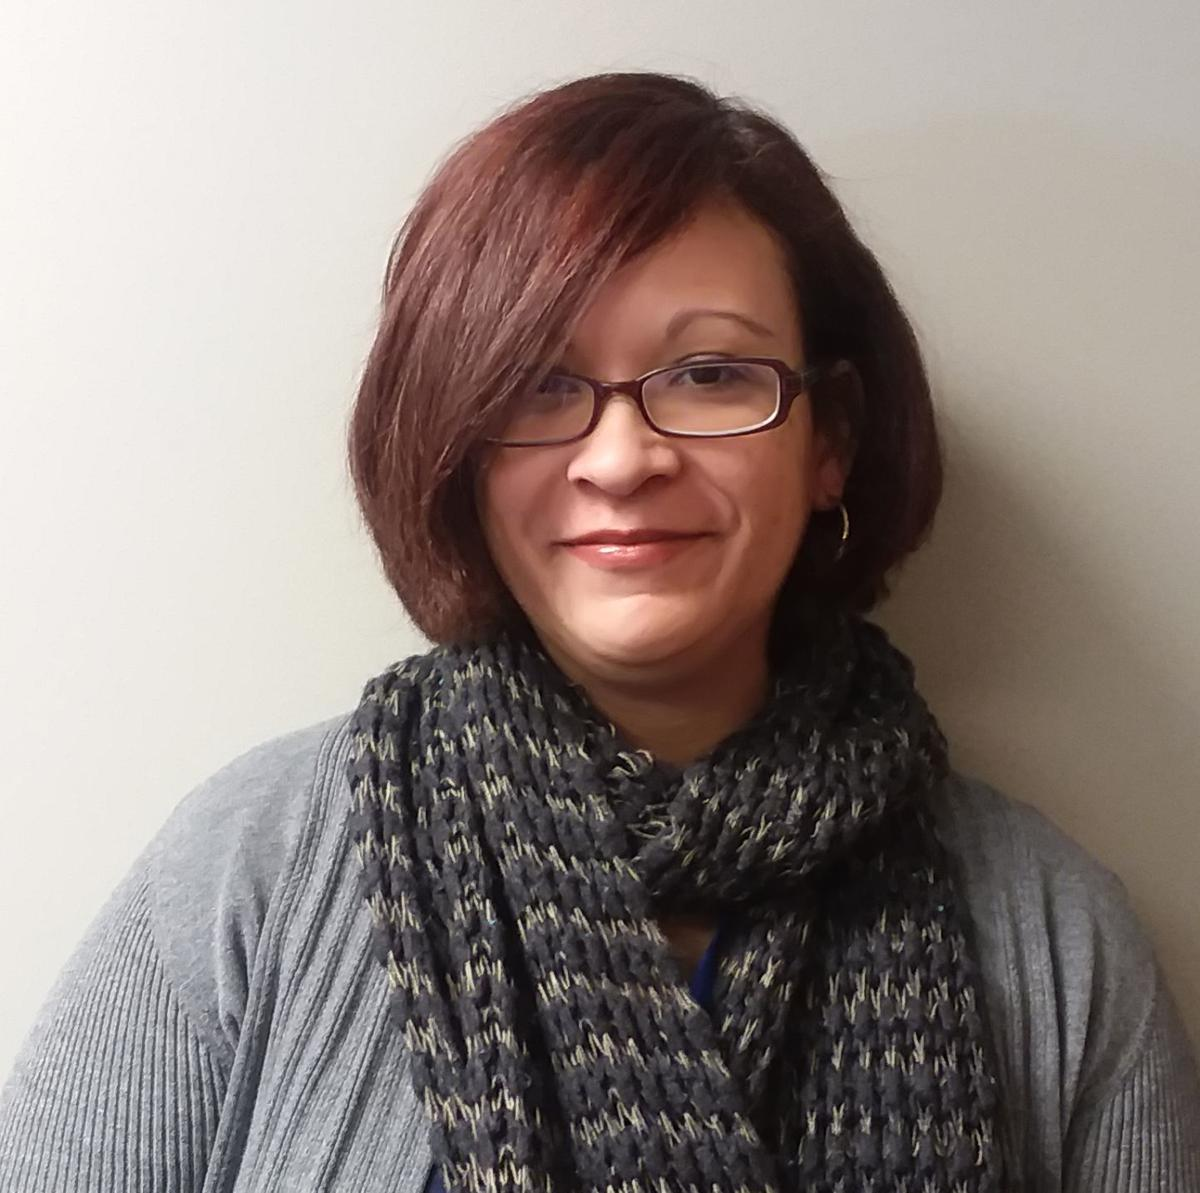 Joanne Ocasio-Bizardi